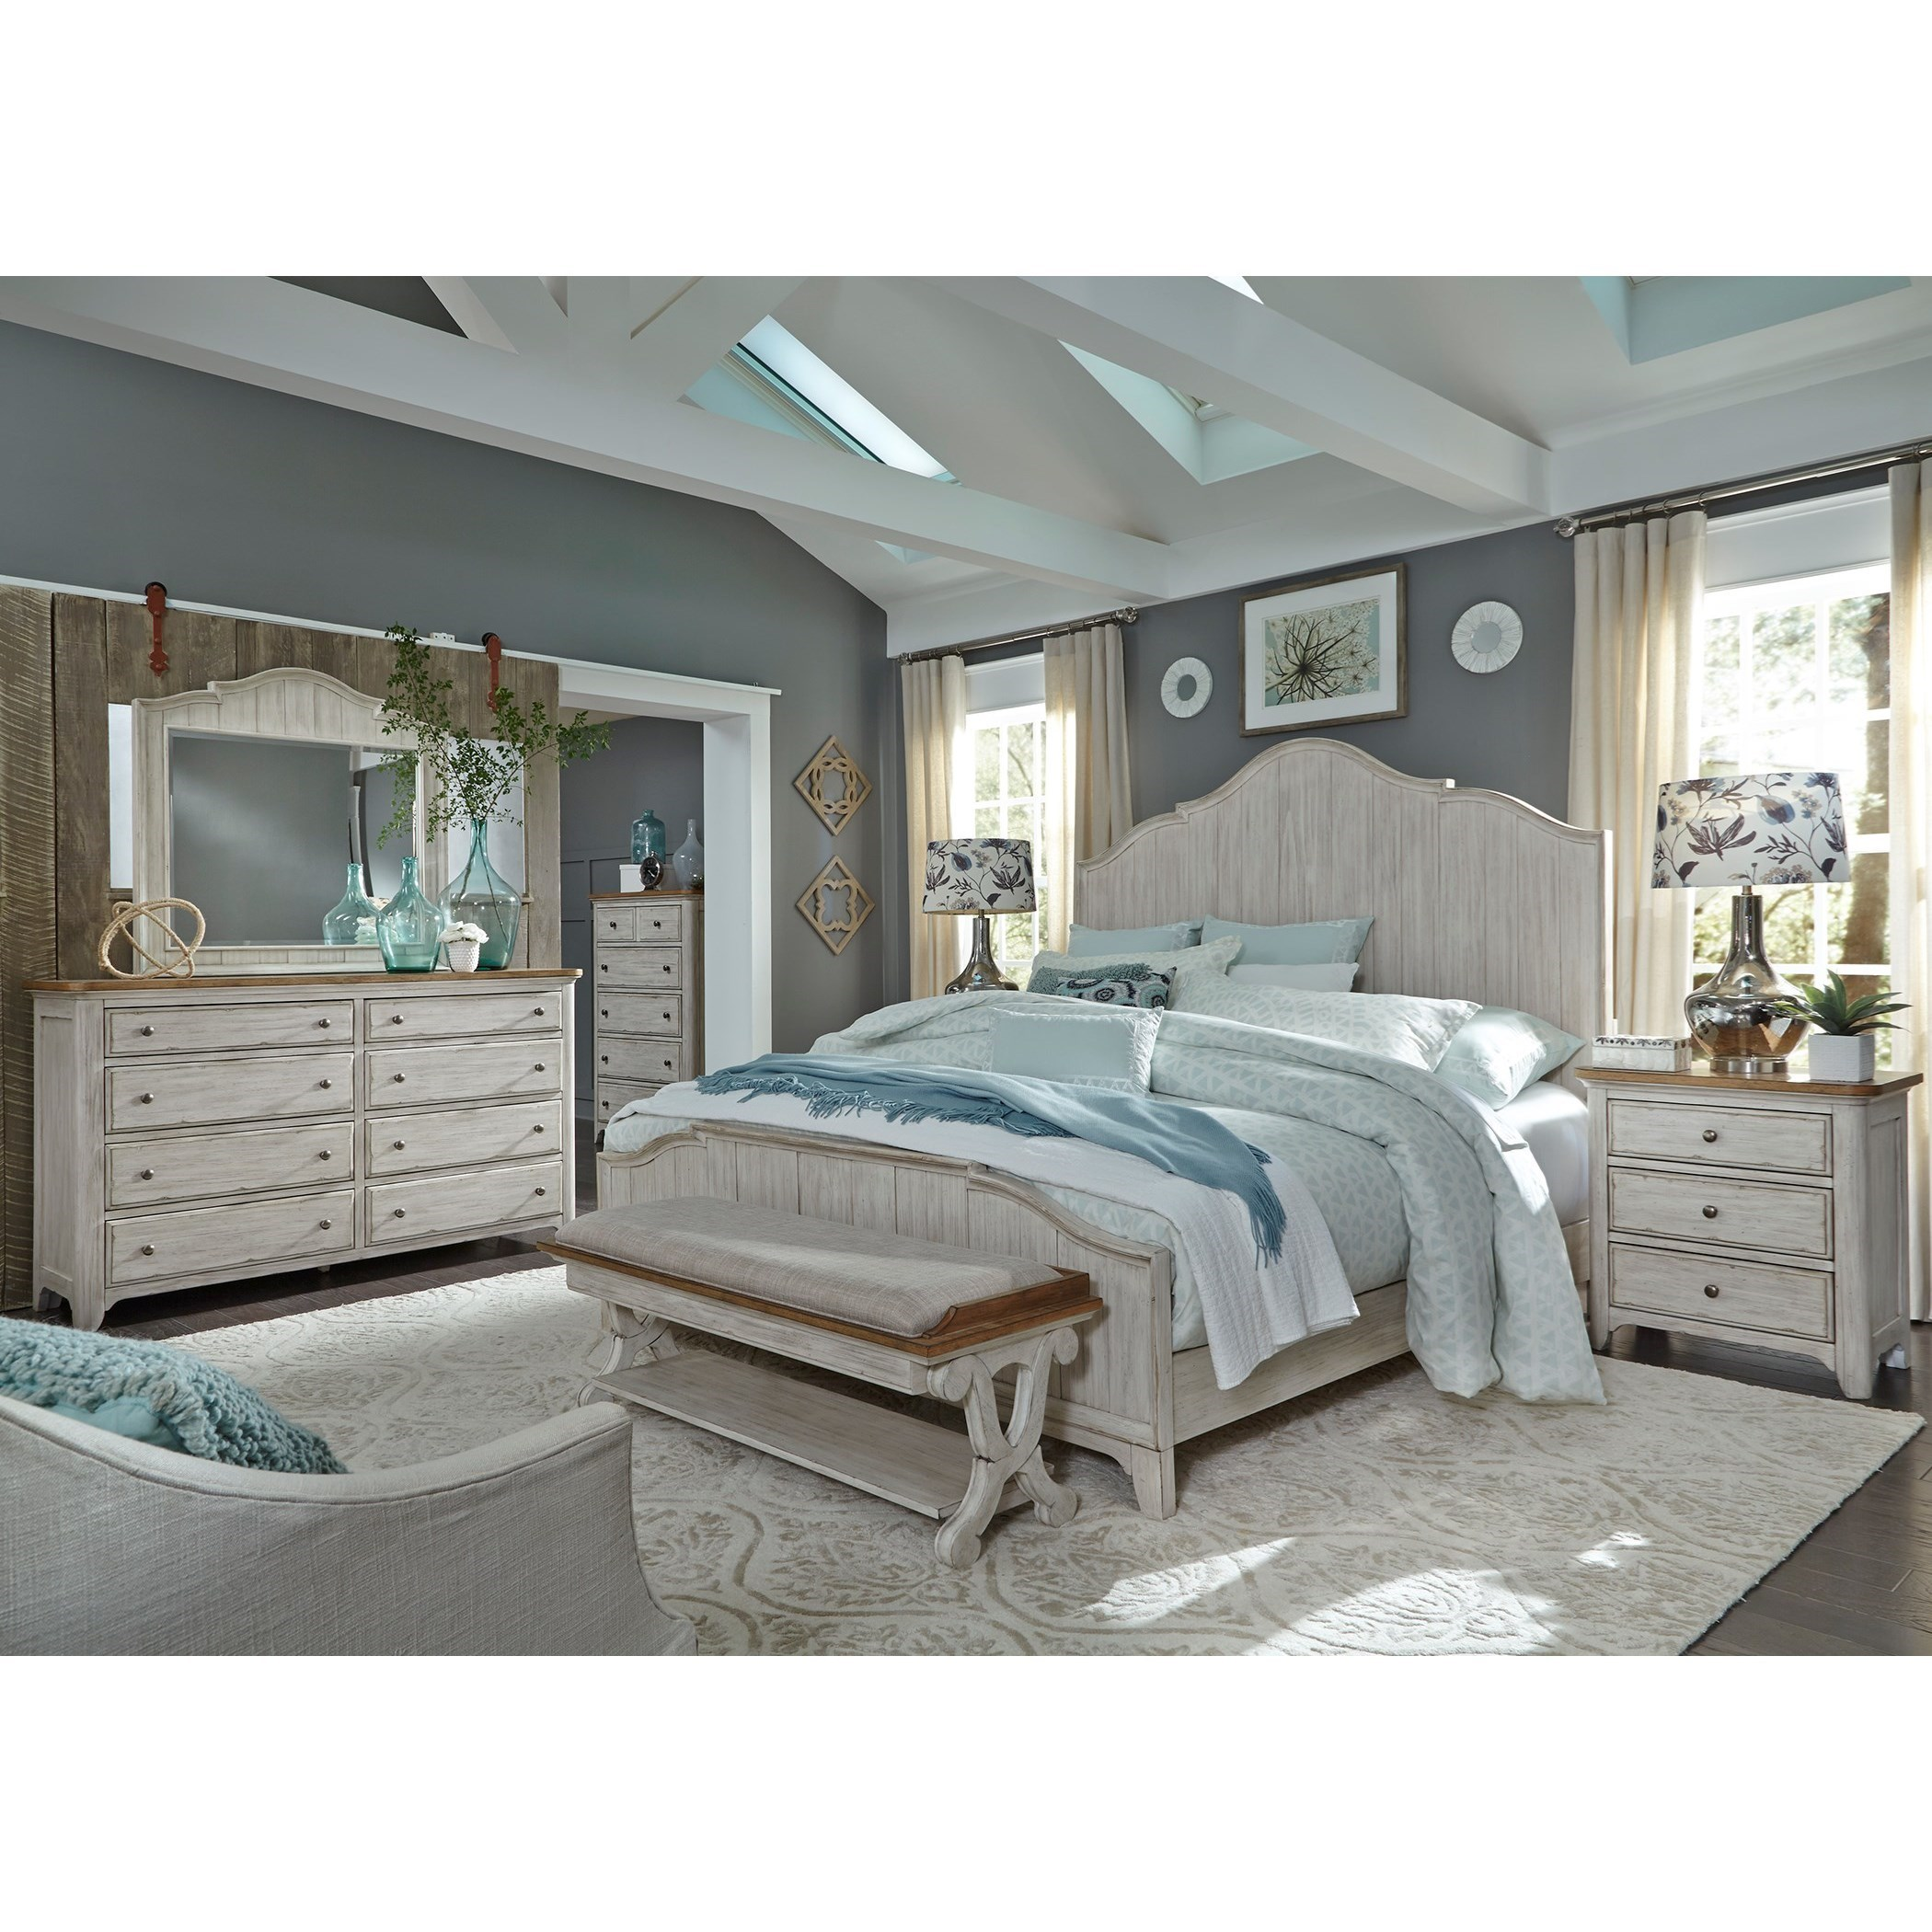 Sarah Randolph Designs Farmhouse Reimagined Queen Bedroom Group